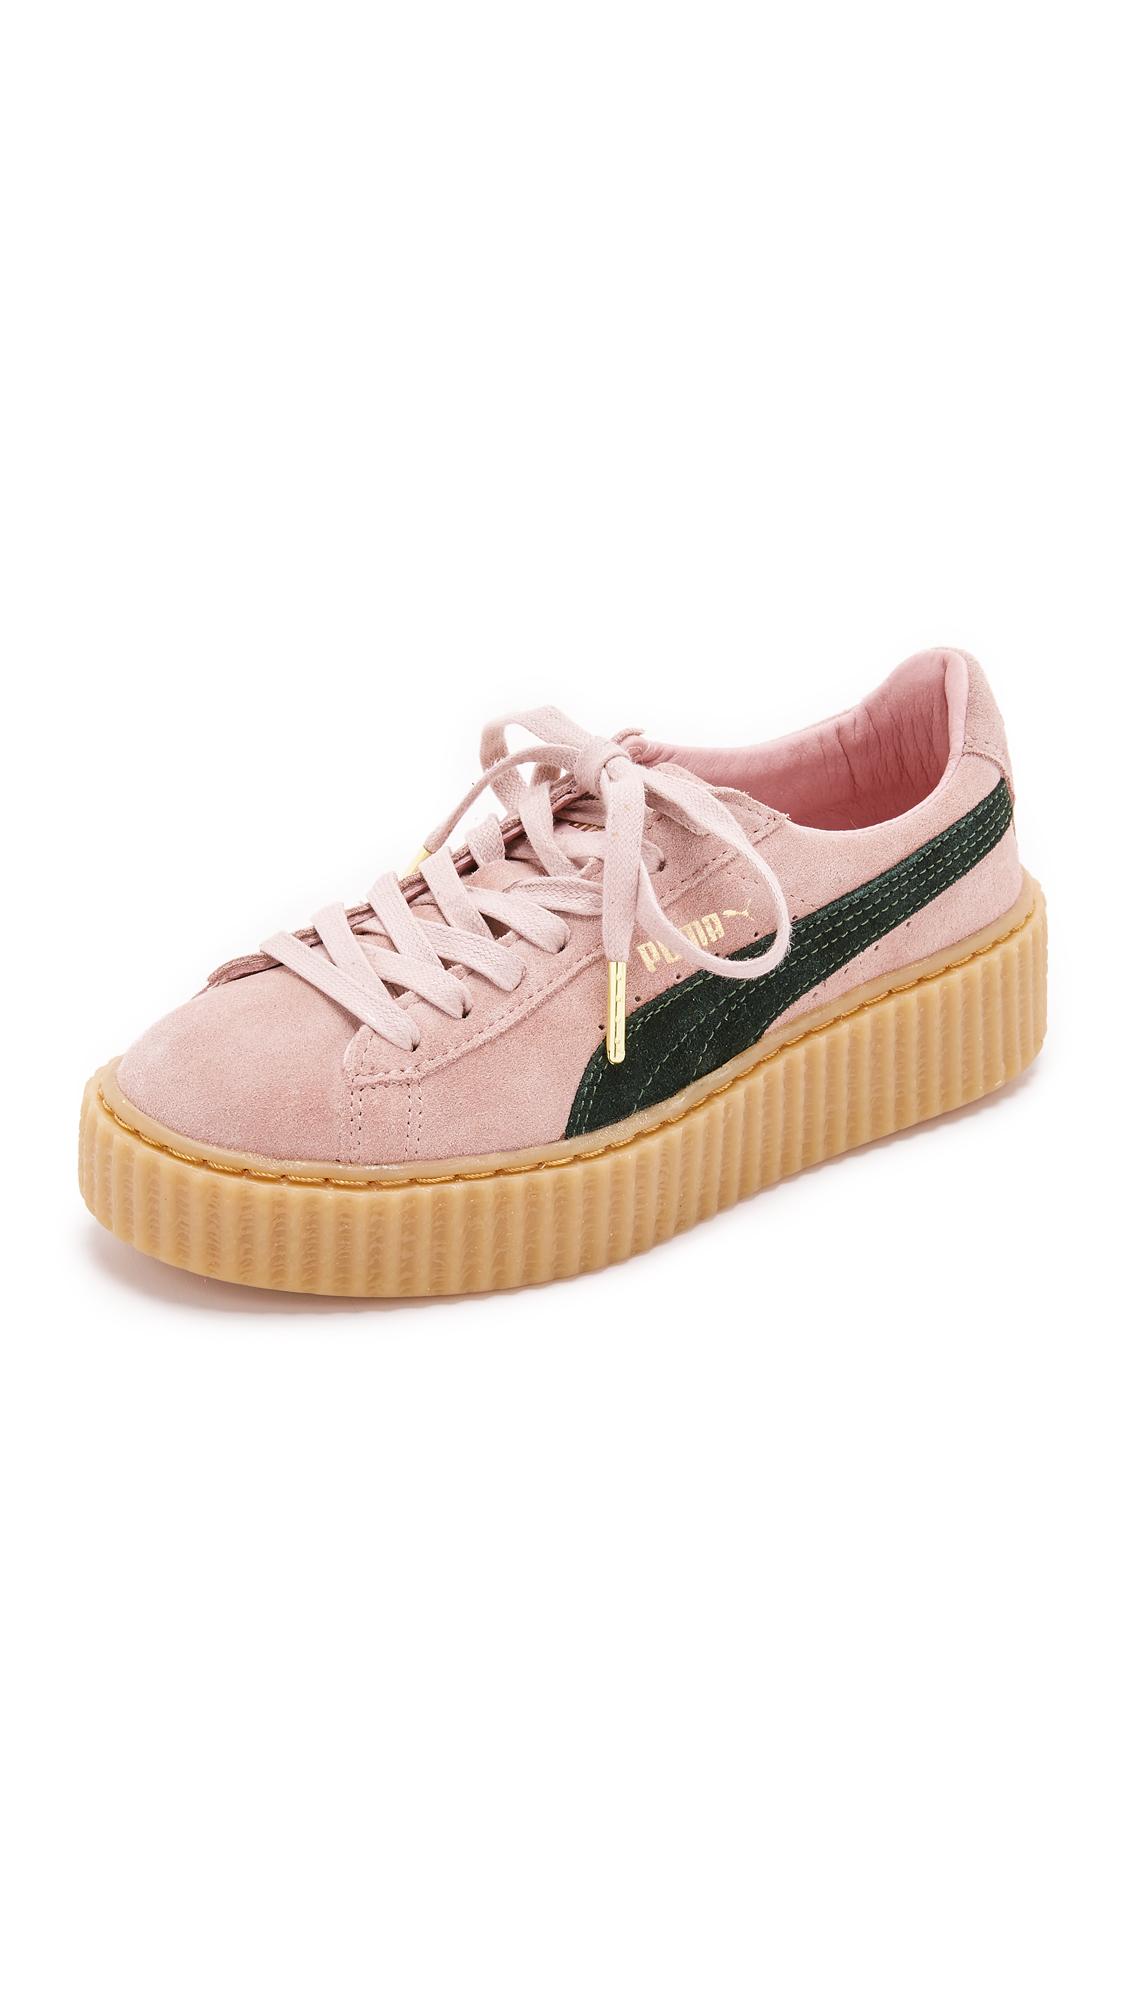 save off 3b076 9a6bb PUMA X Rihanna Creeper Sneakers - Coral Cloud Pink ...